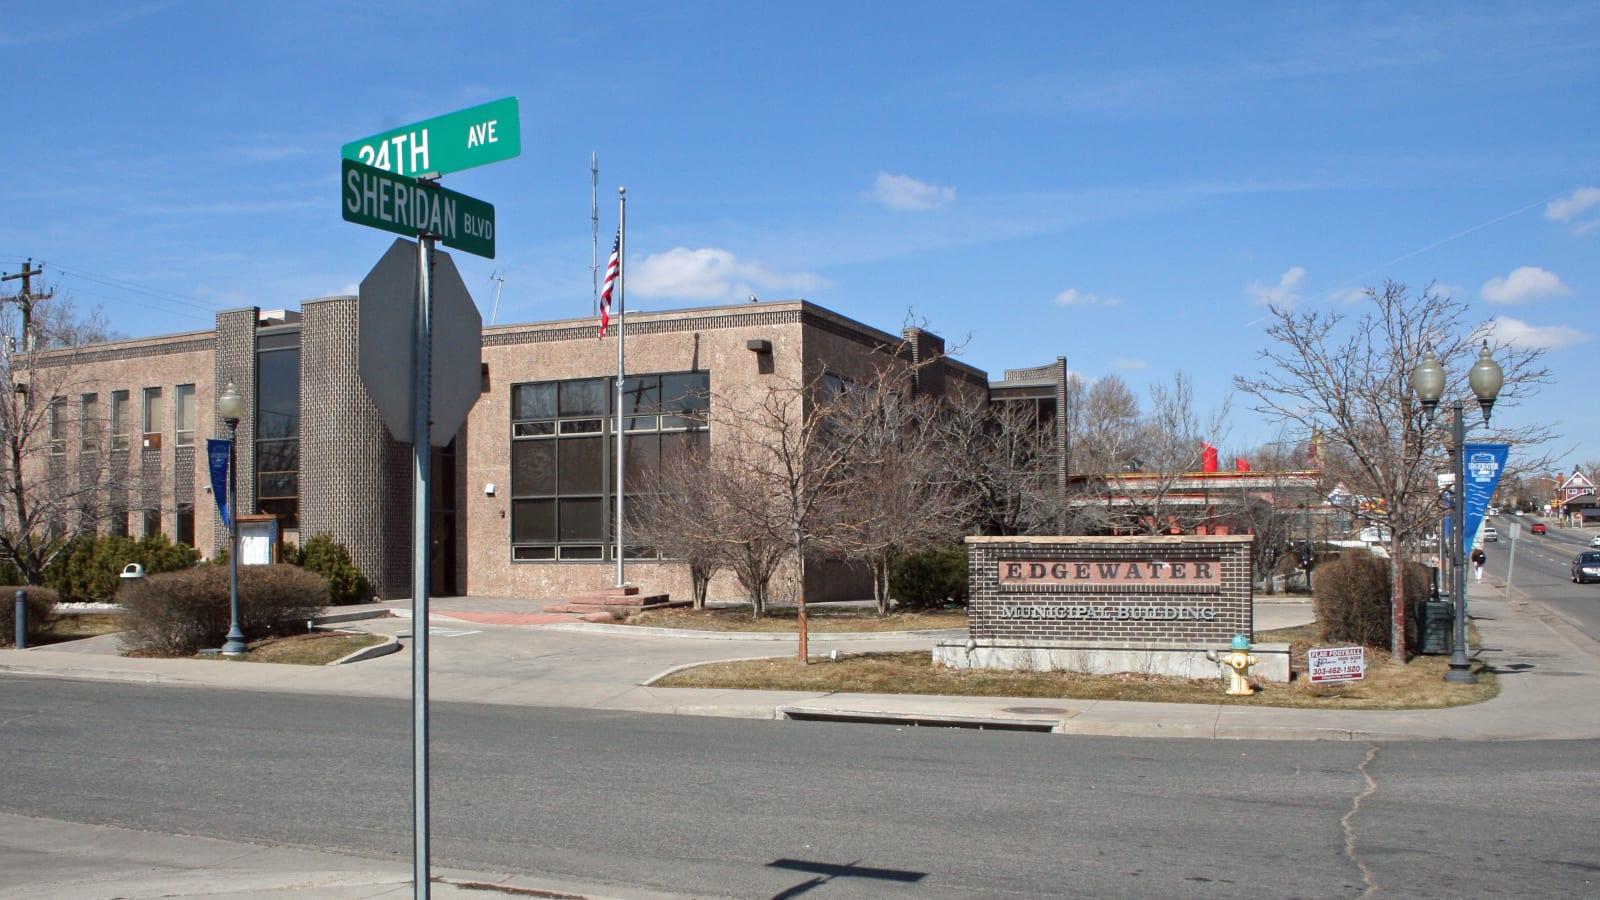 Edgewater Colorado Municipal Building